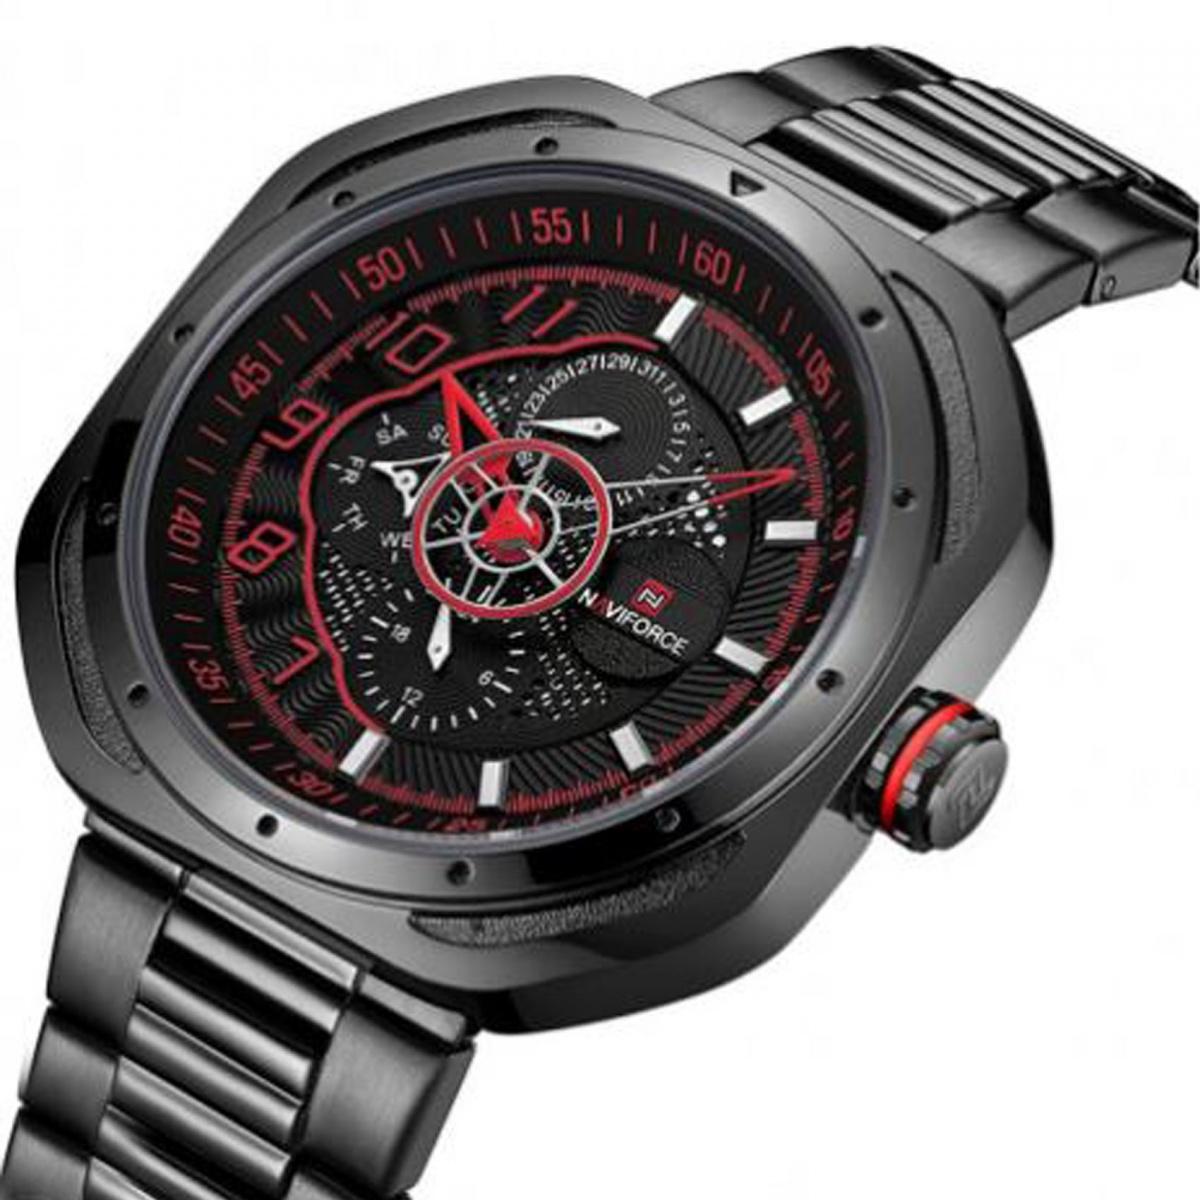 Naviforce 9141SBRB Stainless Chrono Watch - Black